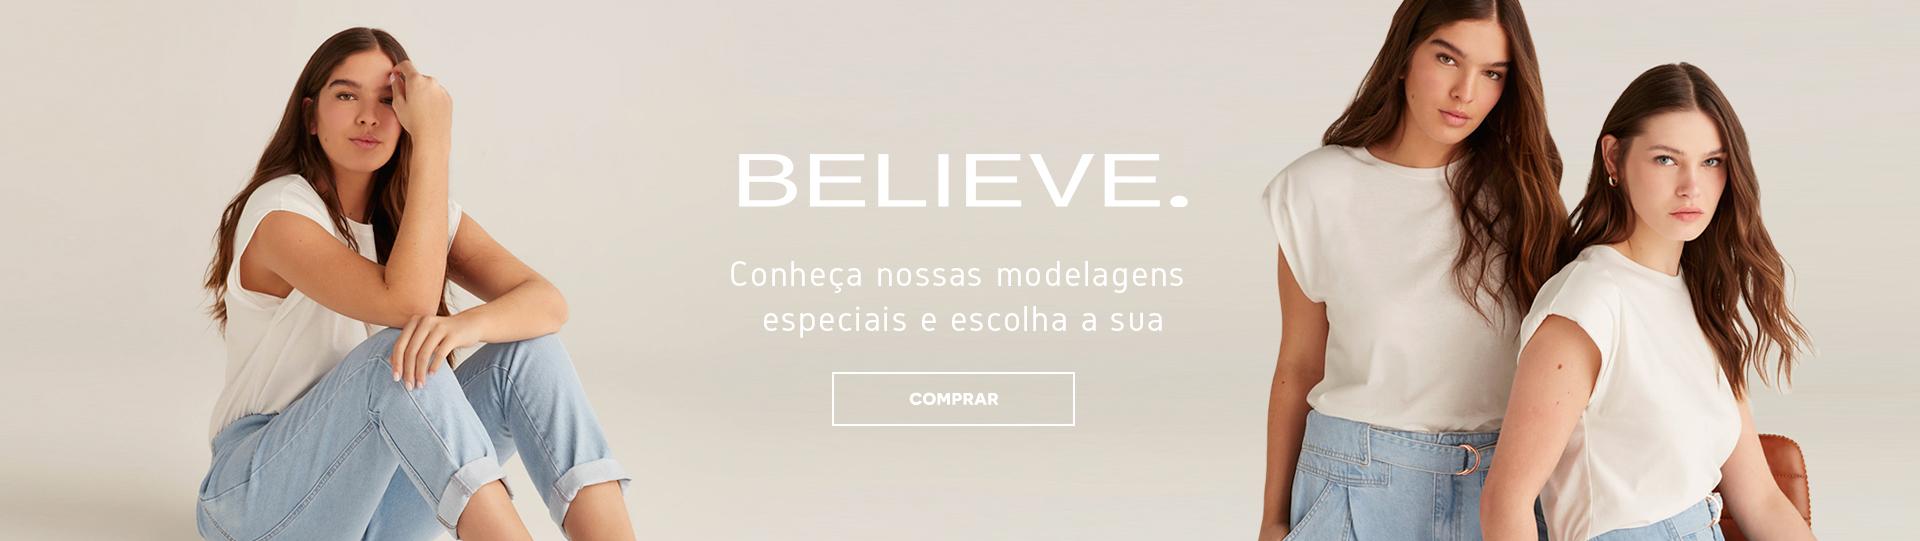 Believe - 201013-Believe